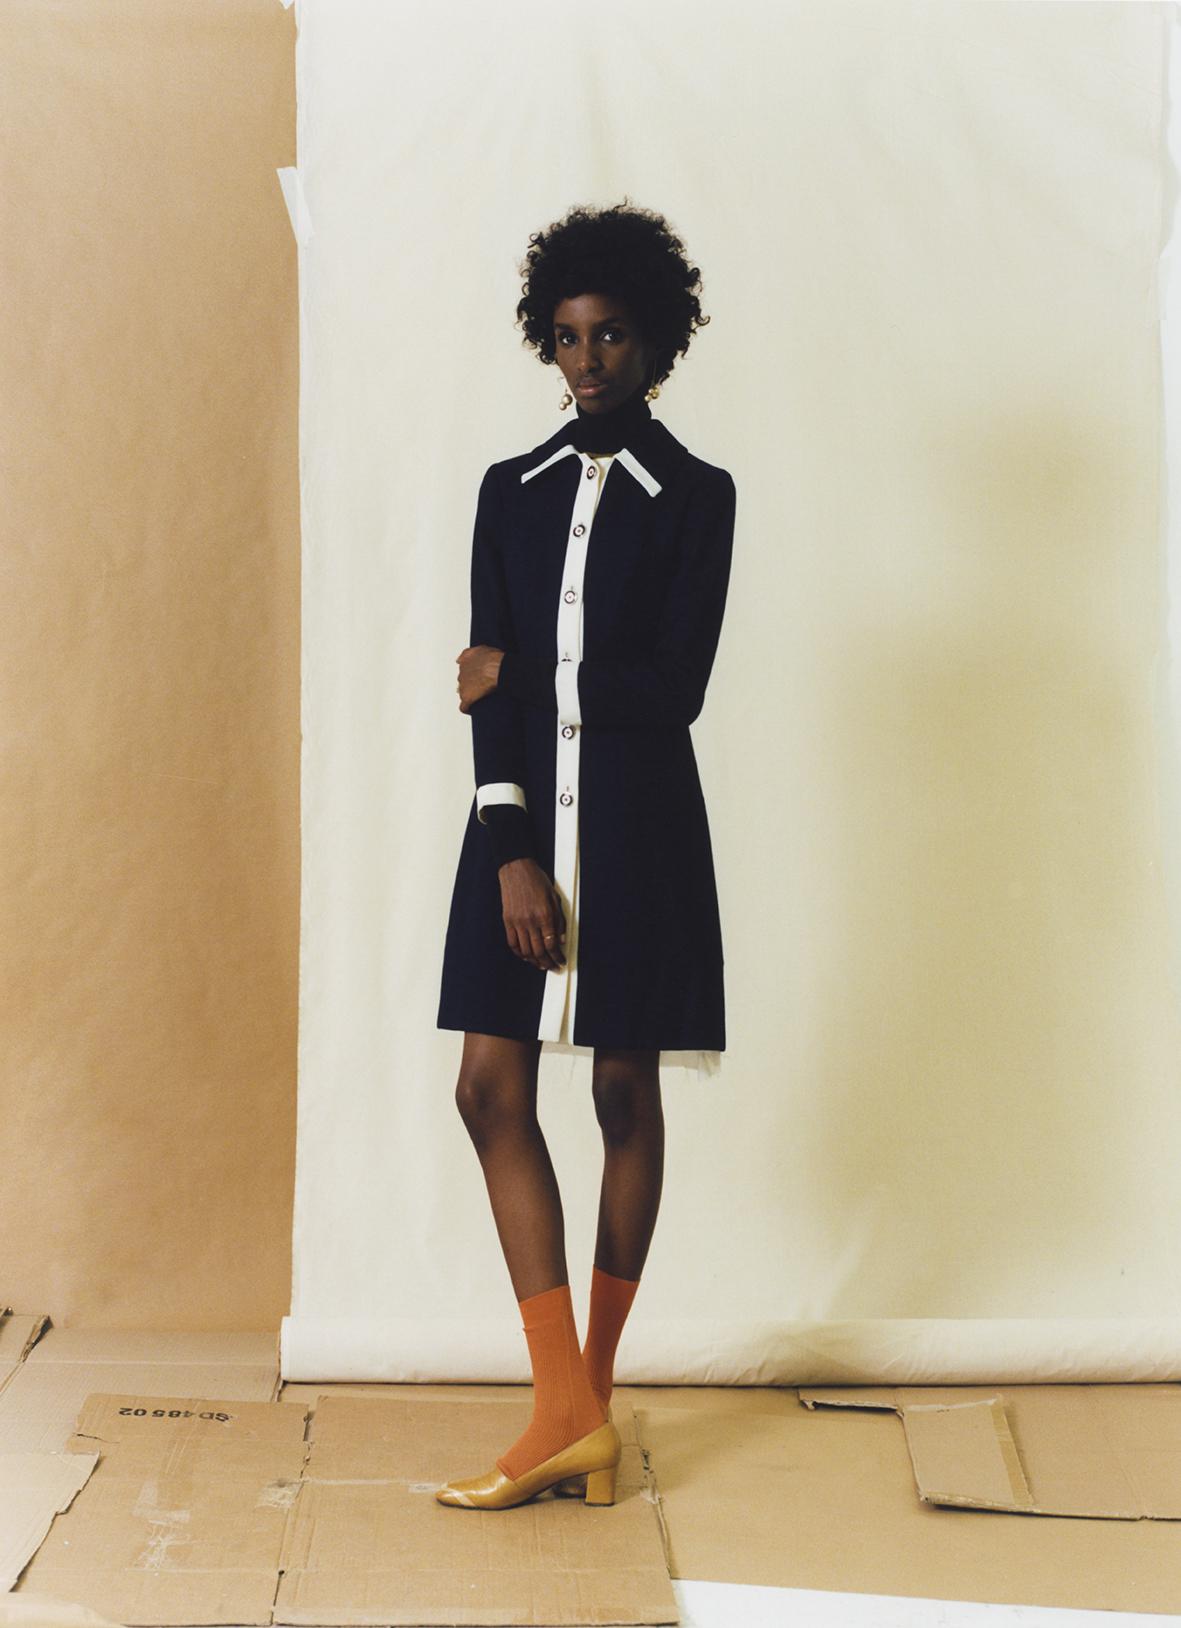 1969 wool gabardine bicolor dress FRANCO JACASSI VINTAGE DELIRIUM, stitched turtleneck PRADA,silk socks MARIA LA ROSA,leather pumps FRANCO JACASSI VINTAGE DELIRIUM, ivory gold pearl earrings CÉLINE.